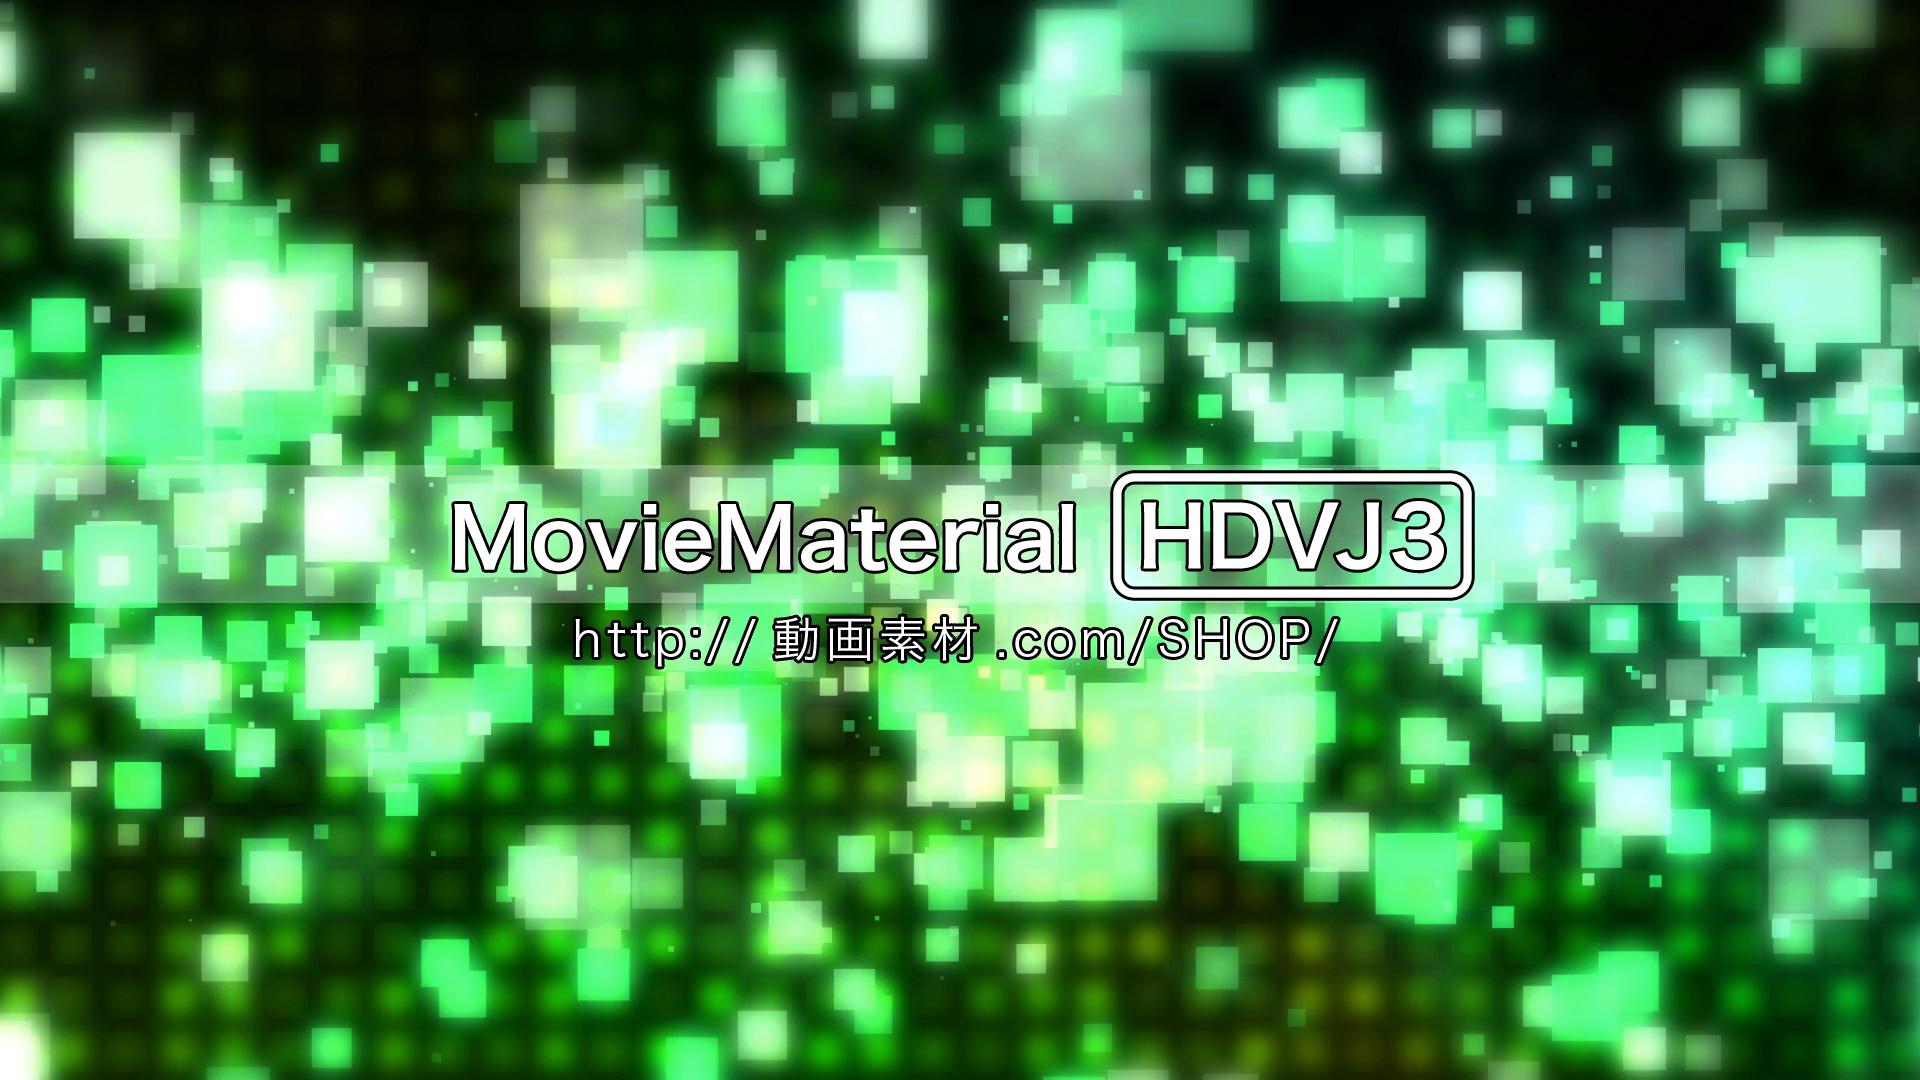 MovieMaterial HDVJ3 フルハイビジョンVJ動画素材集 画像4